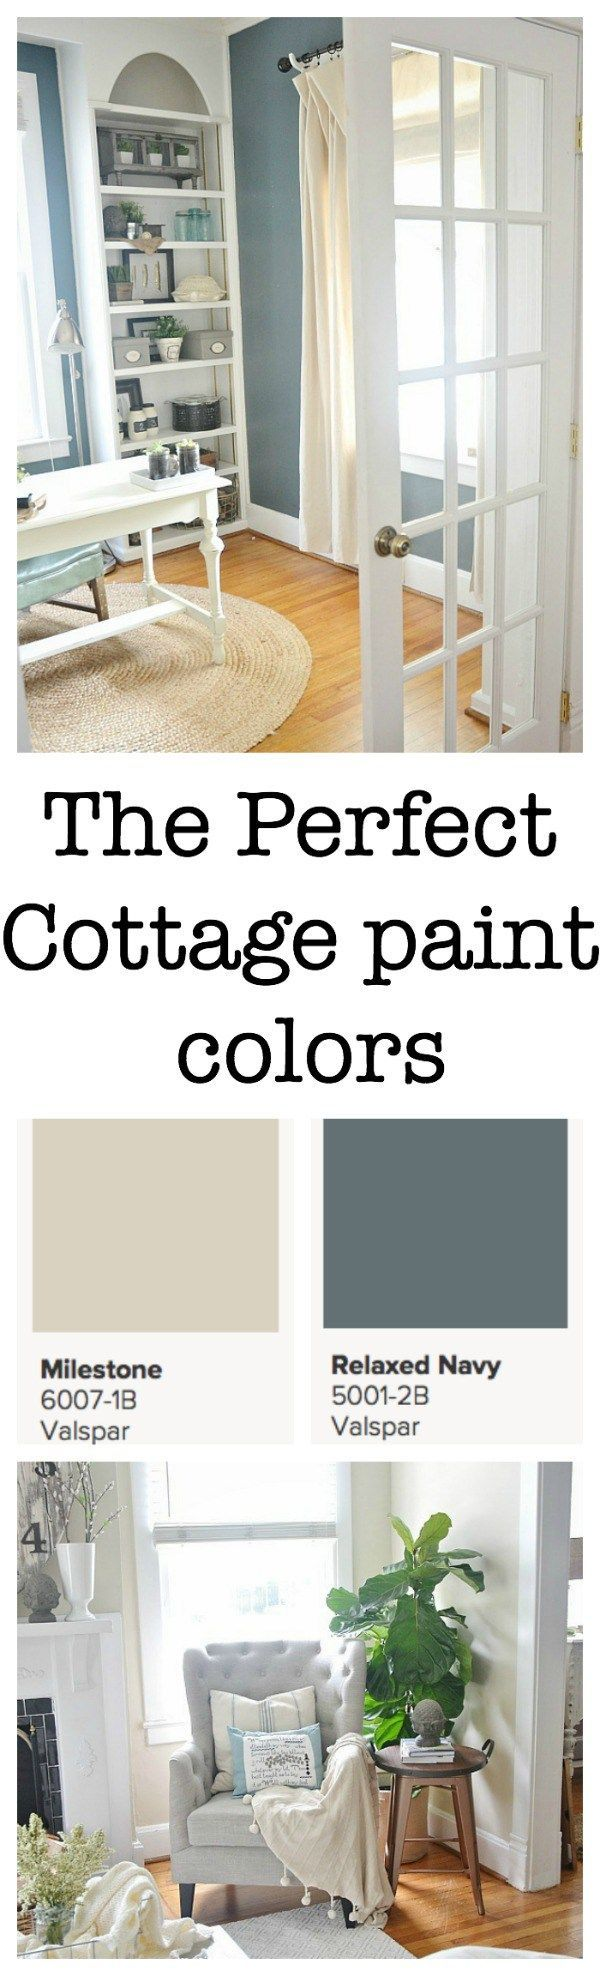 Master bedroom paint colors  LMB Rental Paint colors  Part   Cottage paint colors Master